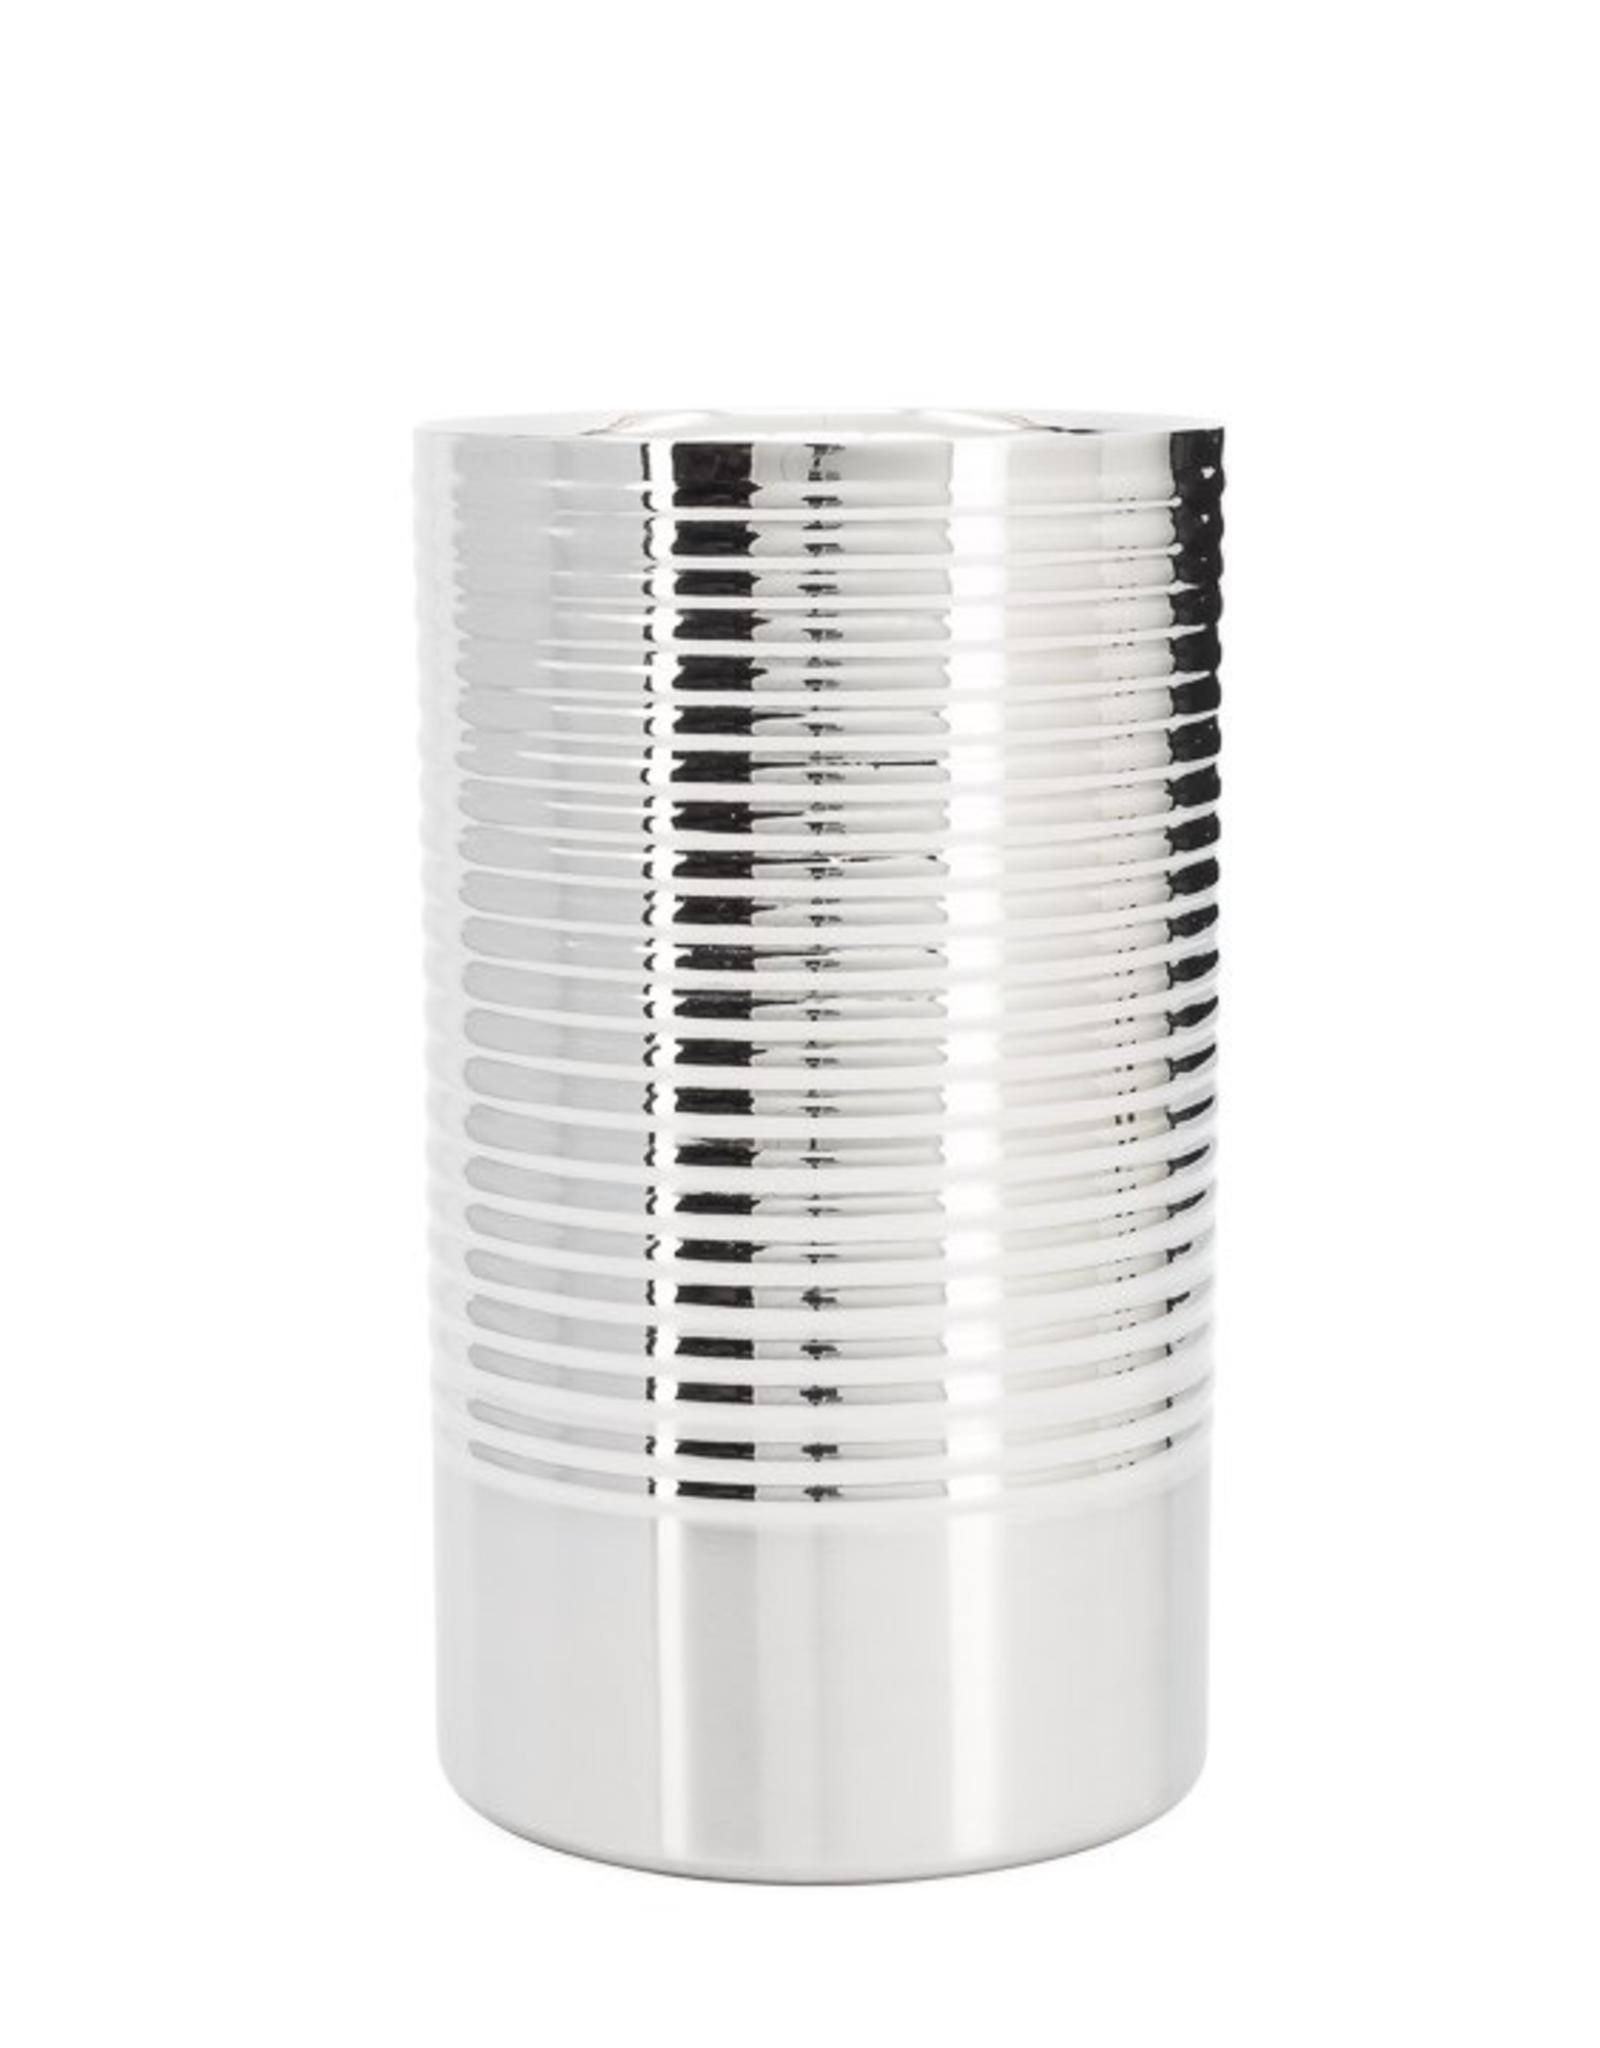 Axis Wine Cooler